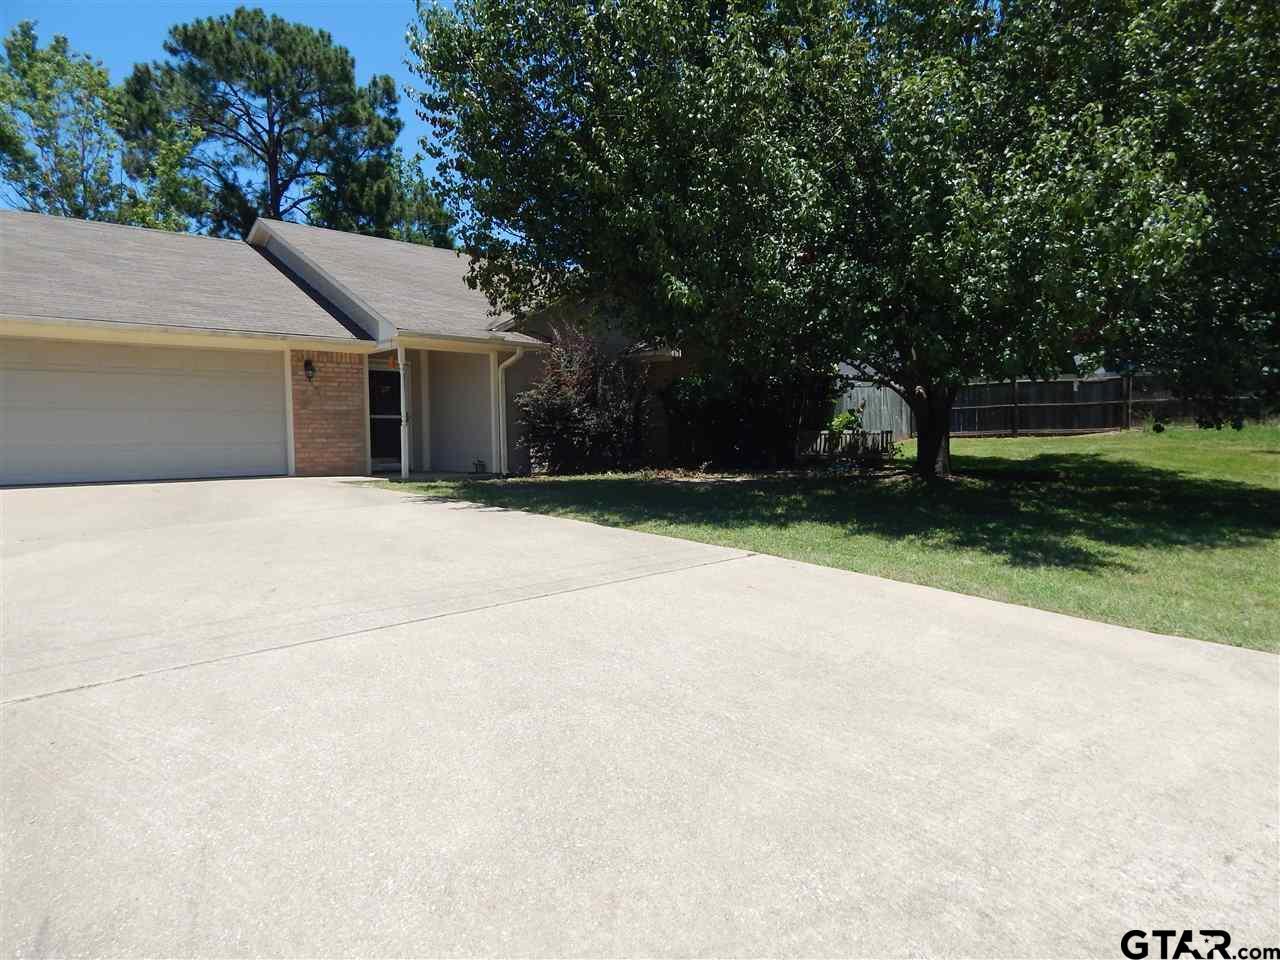 15635 Bay View Circle, Bullard, TX 75757